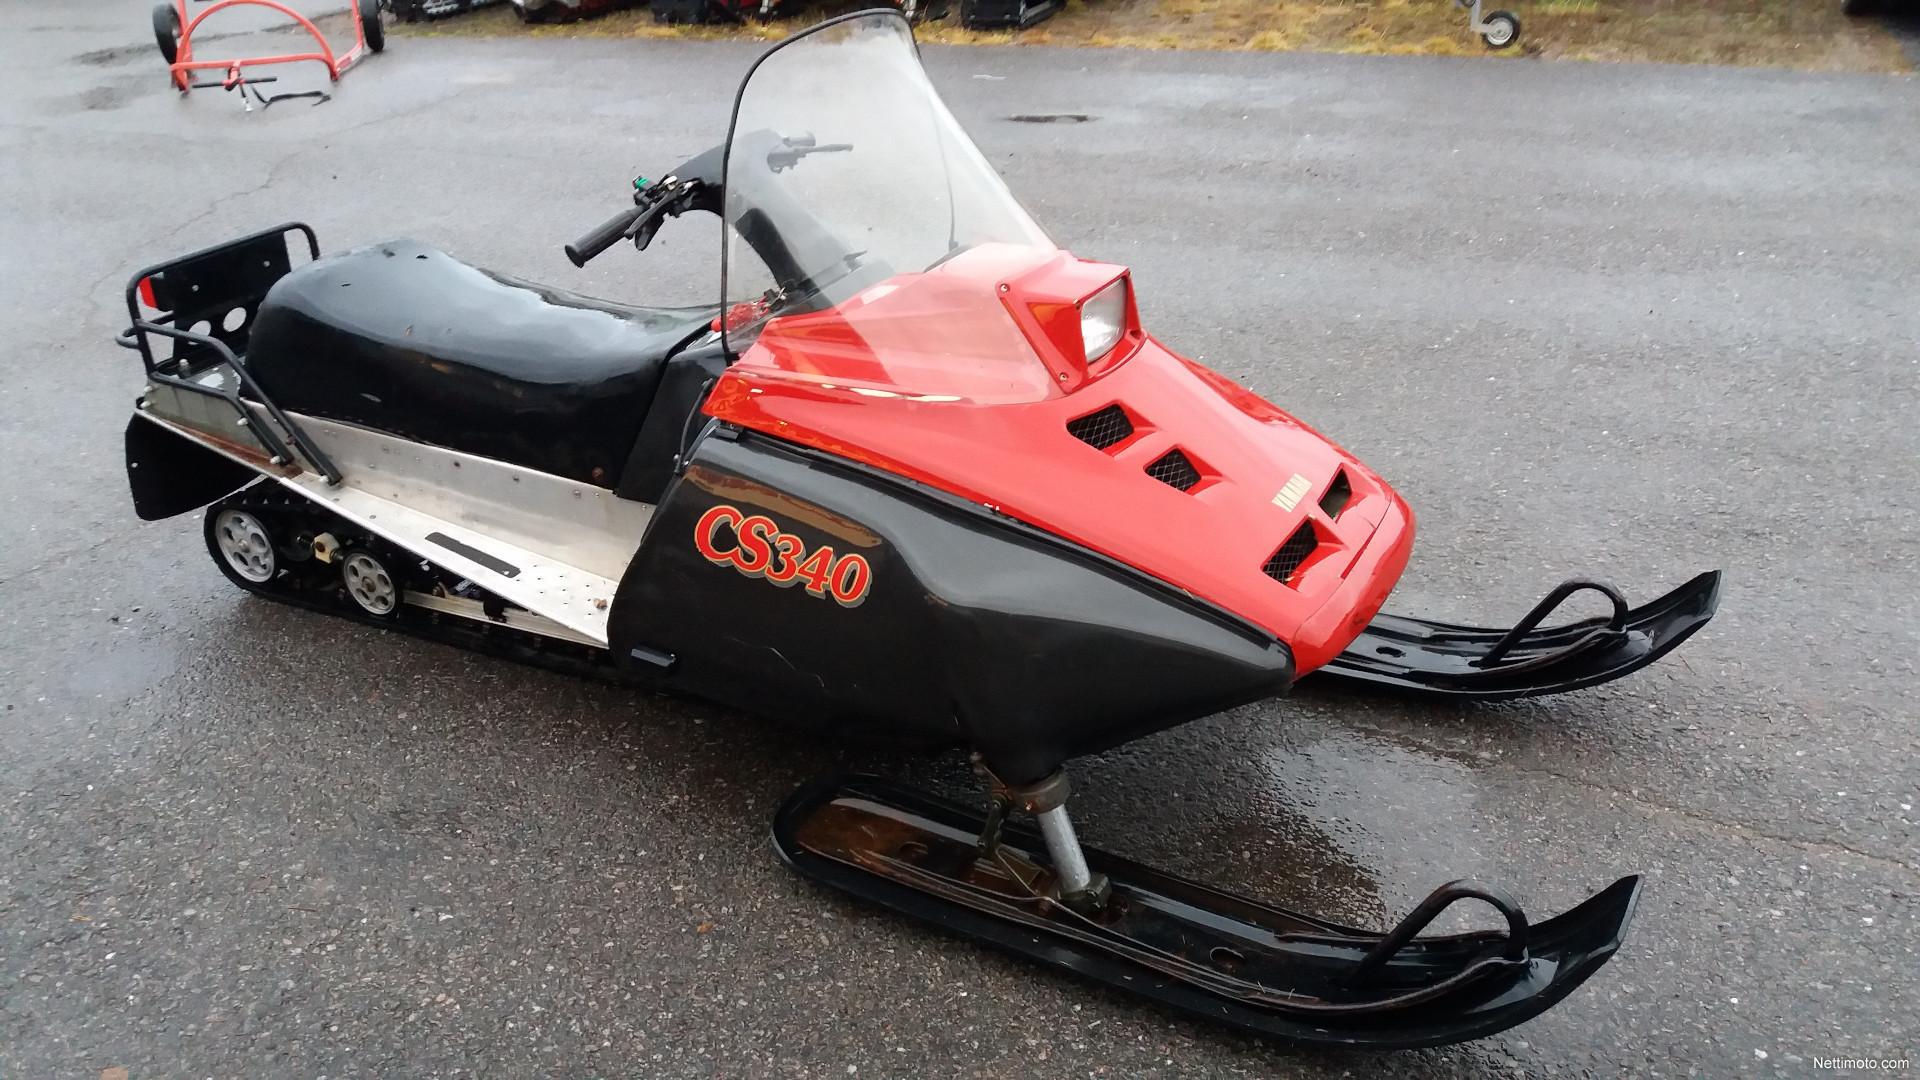 Yamaha Ovation CS 340 LT 136 350 Cm179 1991 Rovaniemi